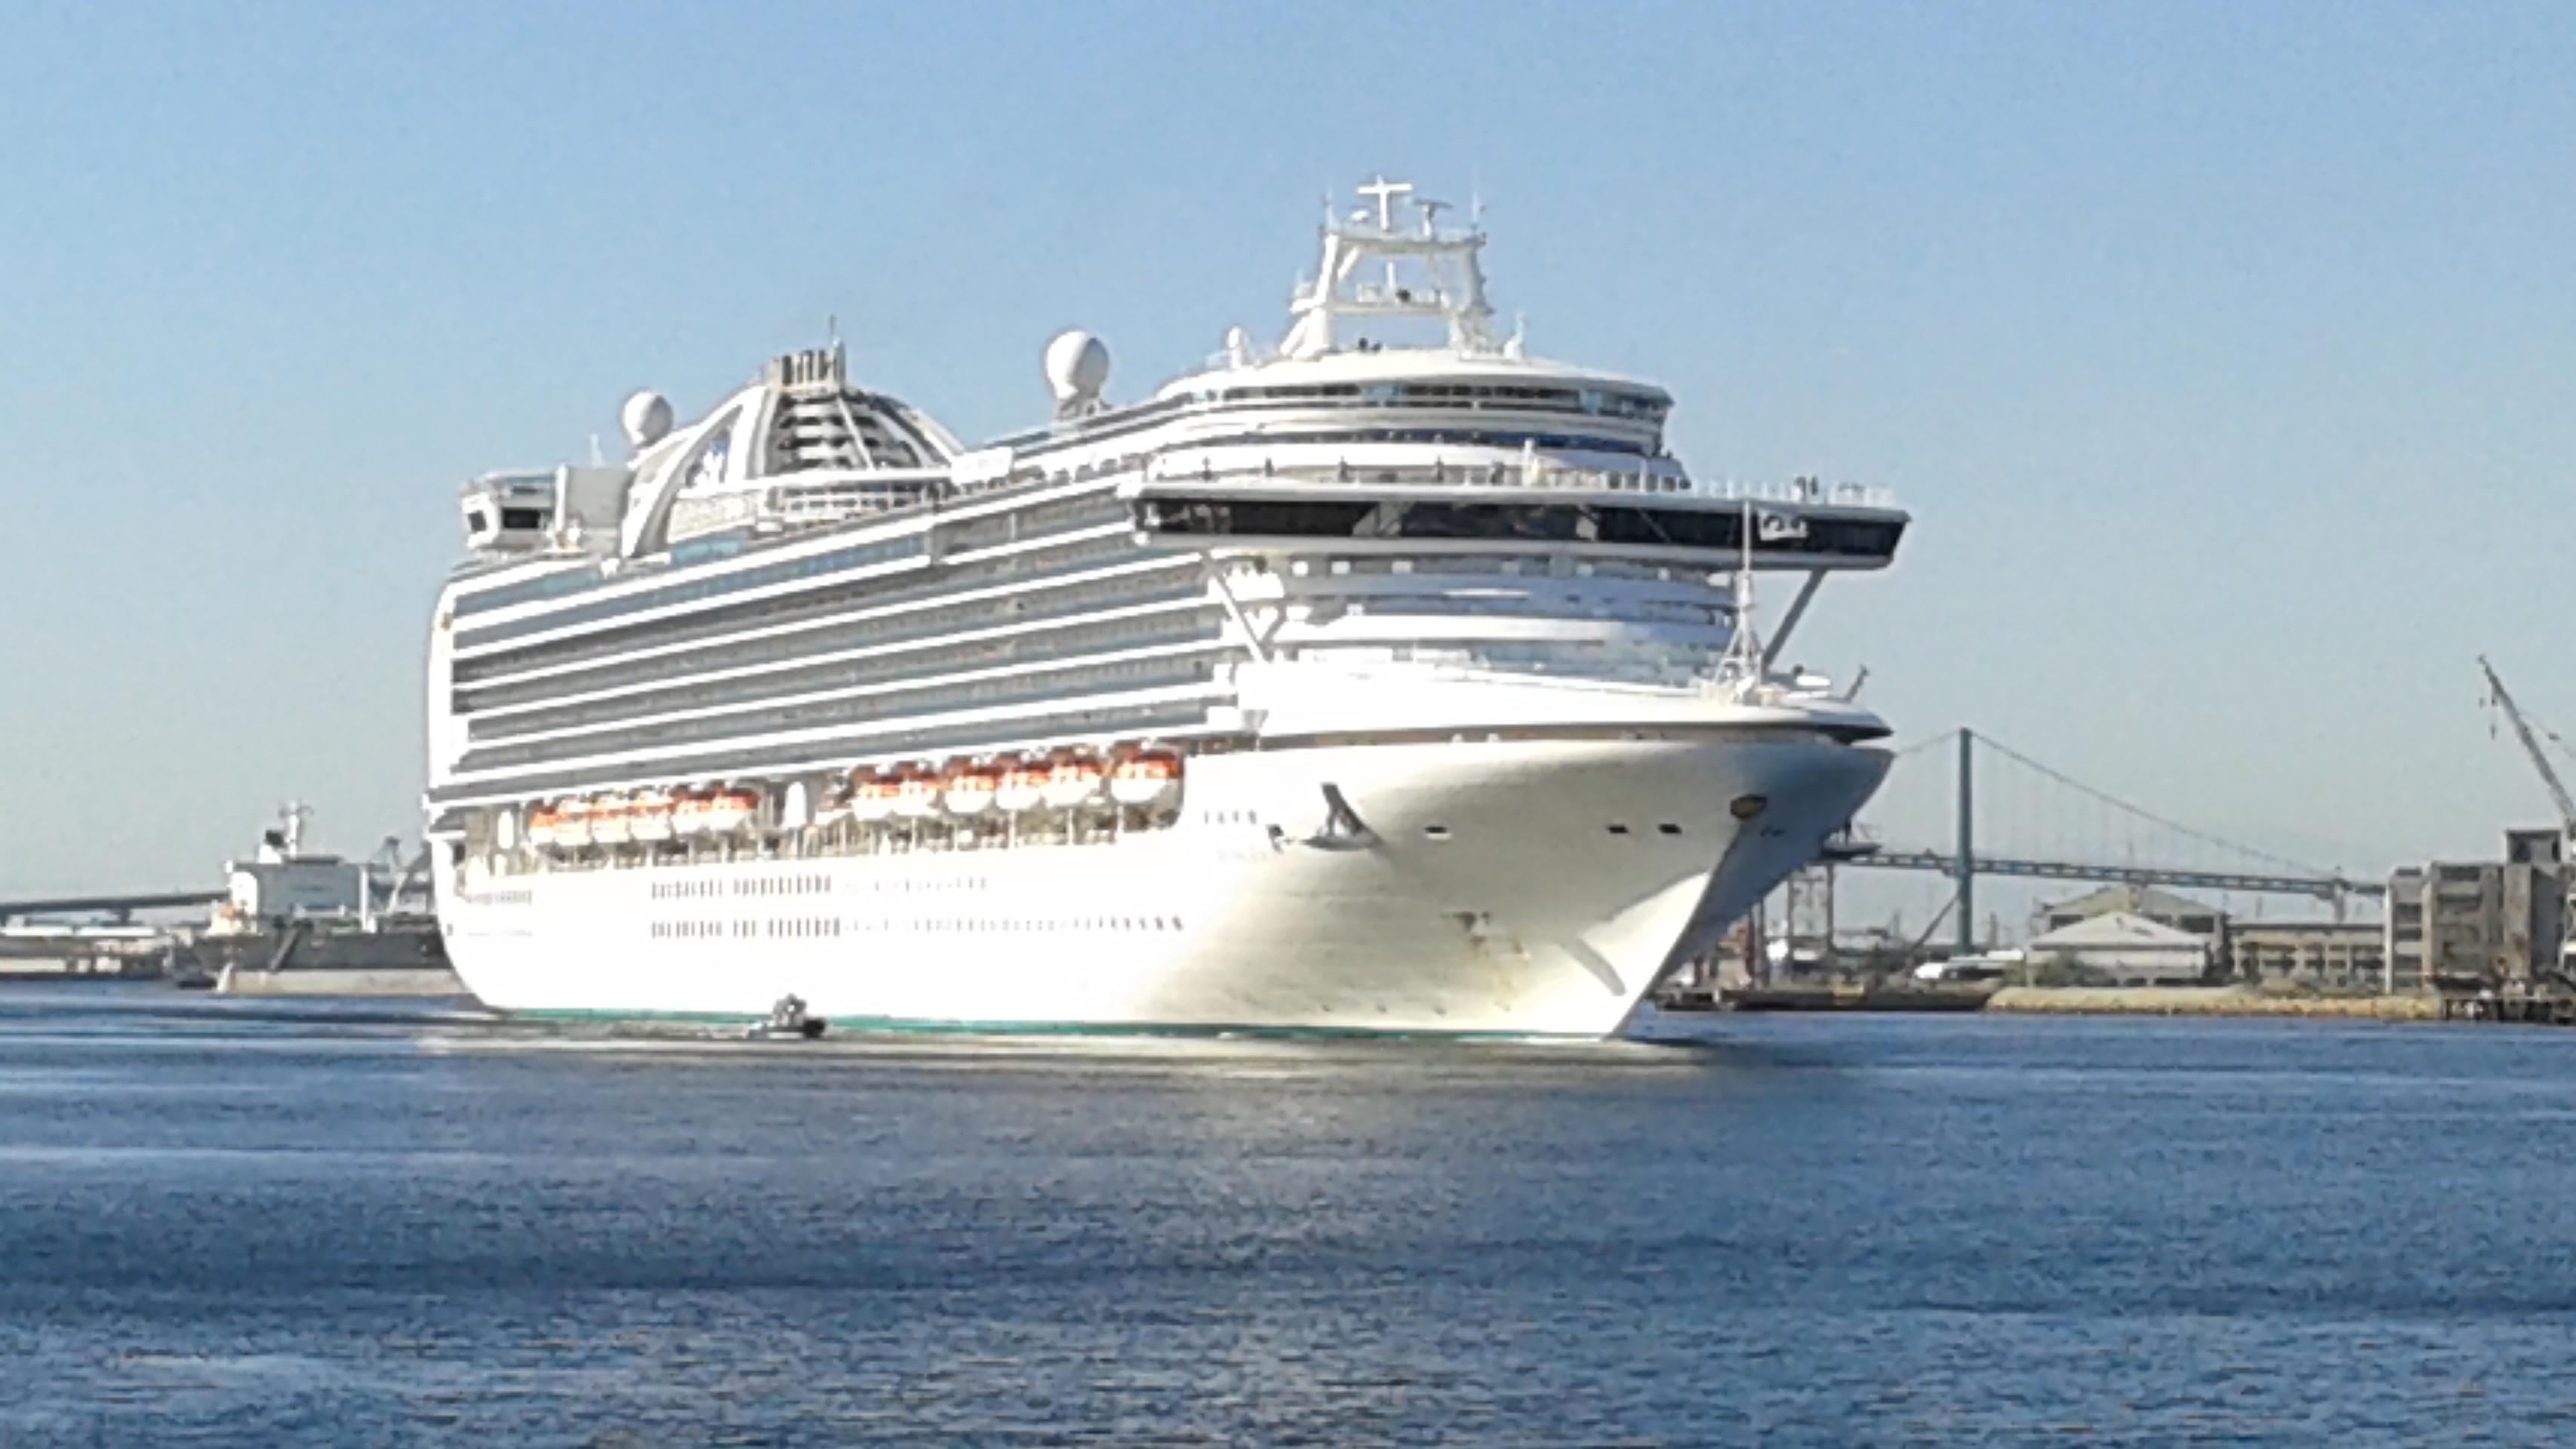 All Events For Ruby Princess Port Of Los Angeles San Pedro Calendar - Cruise to ensenada